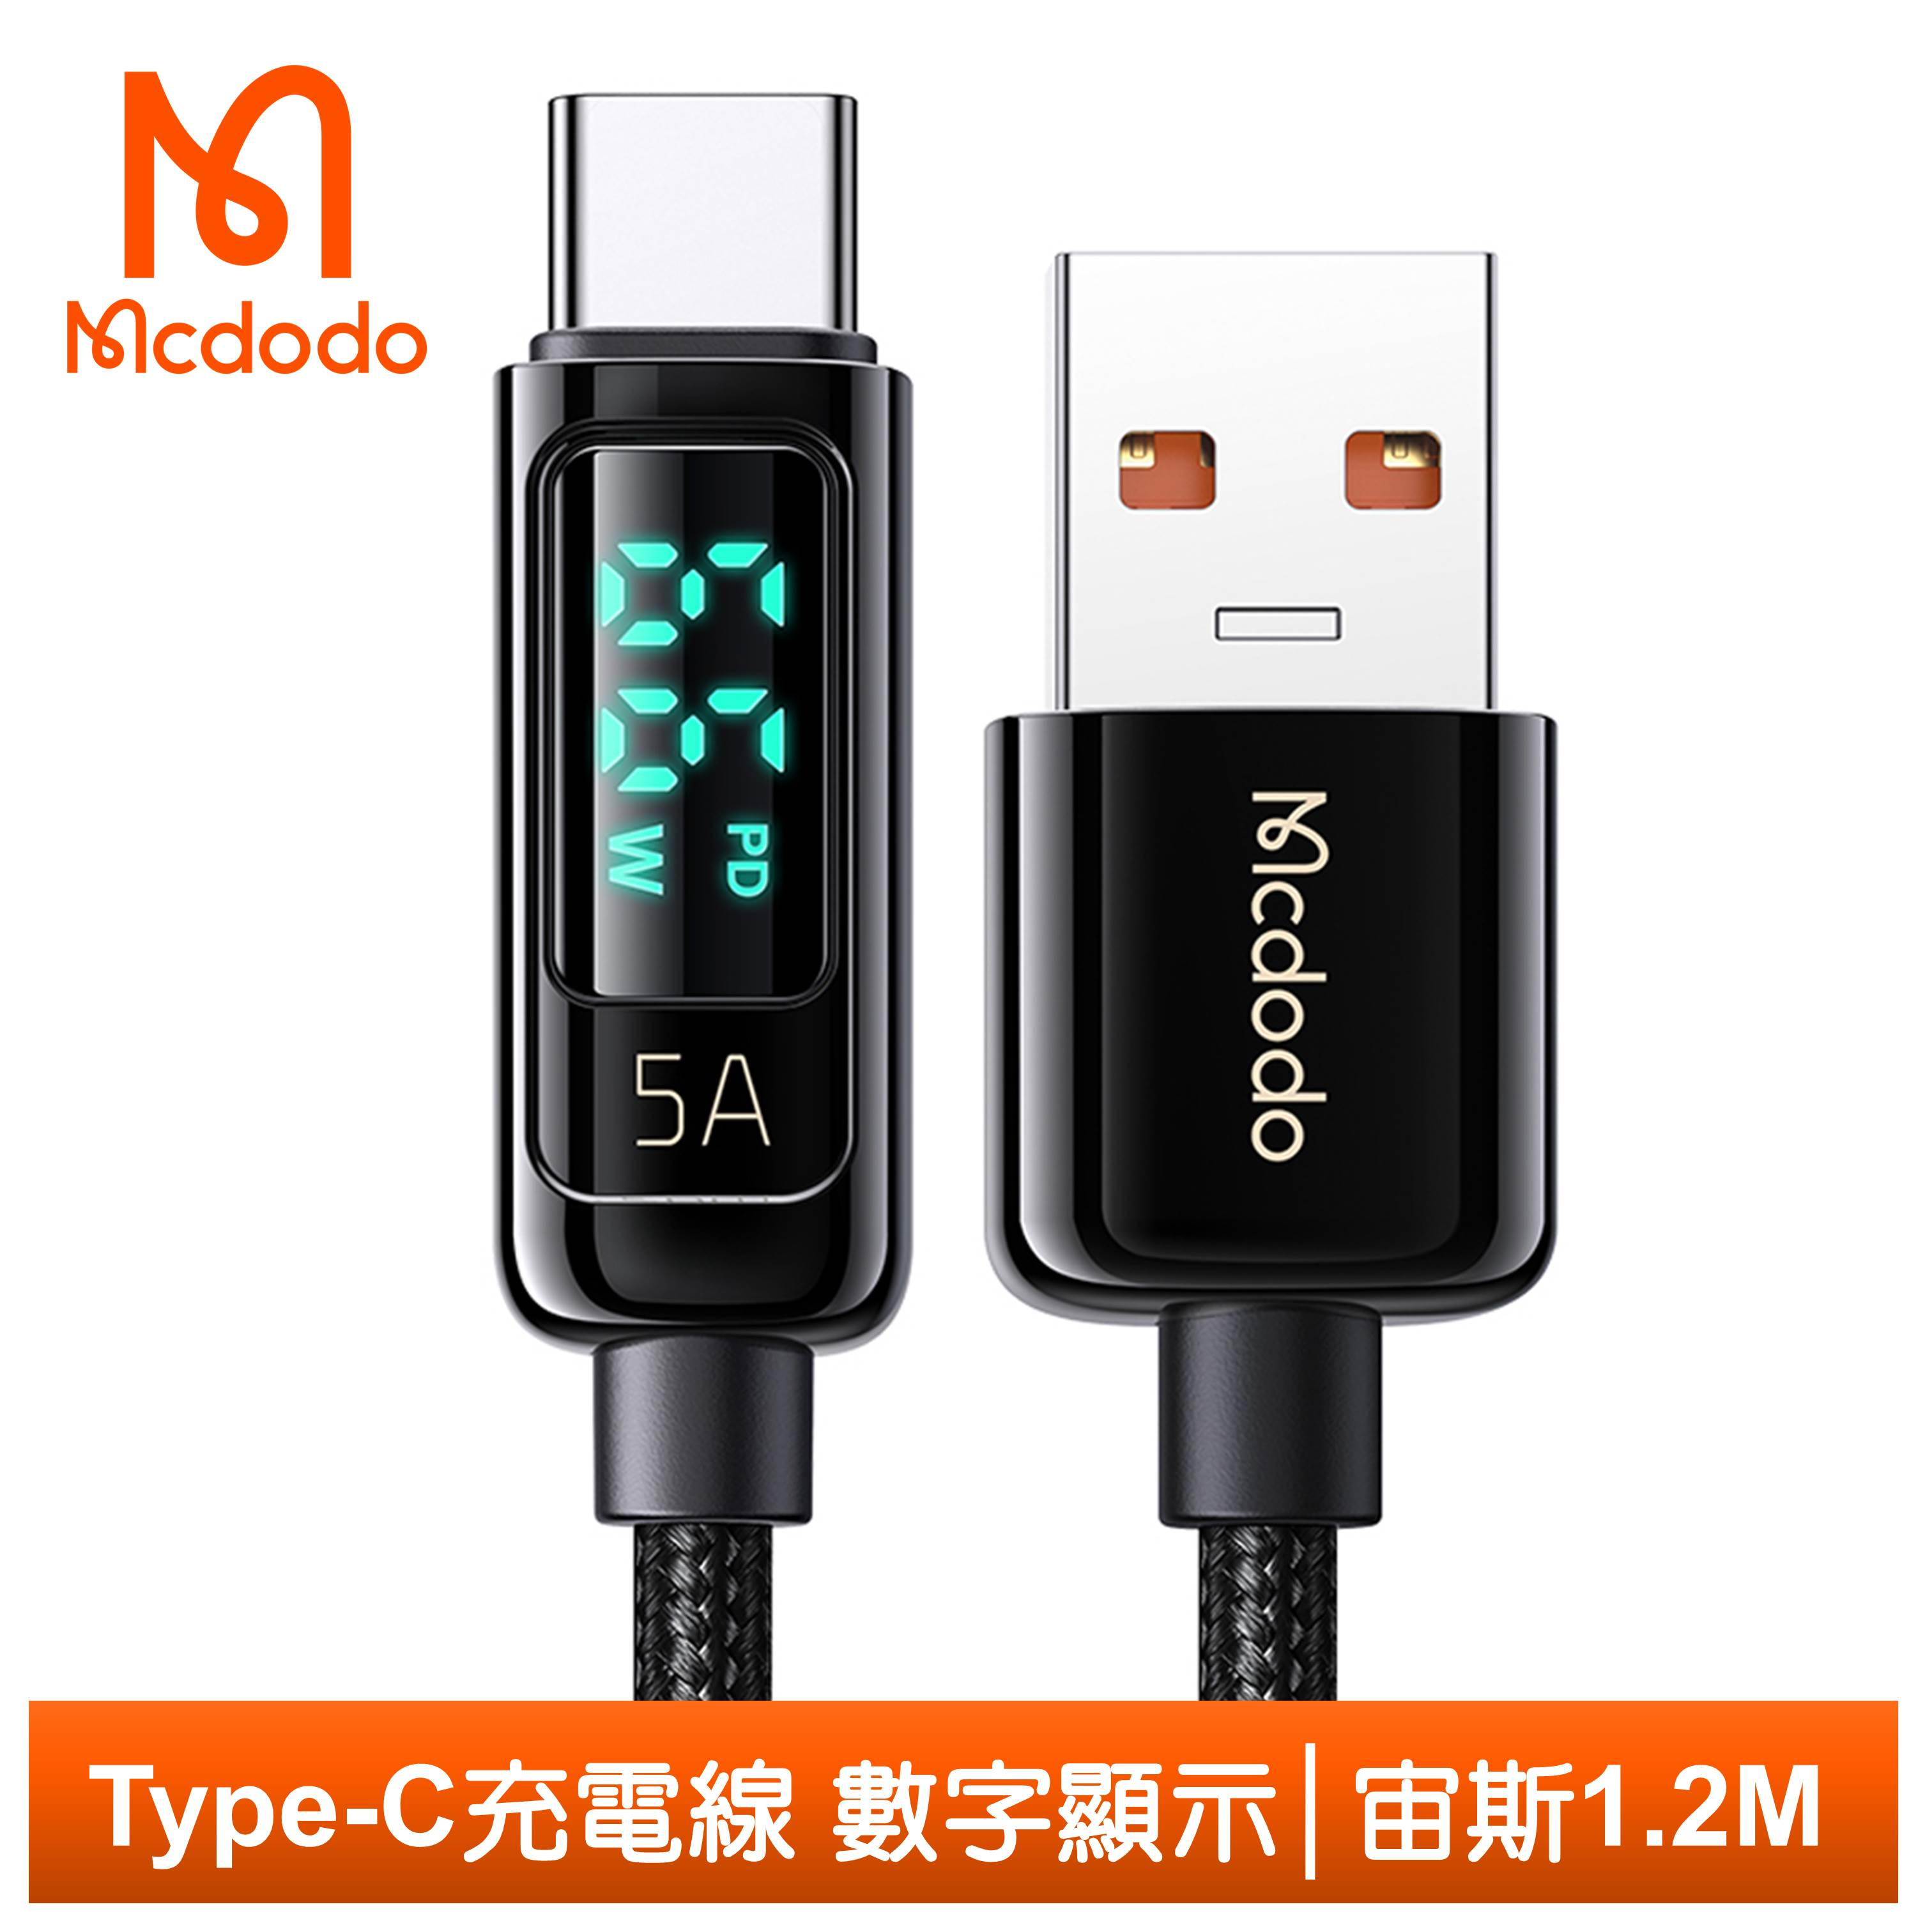 Mcdodo麥多多台灣官方 Type-C充電線傳輸線閃充線編織快充 QC 功率數顯 宙斯系列 1.2M 黑色